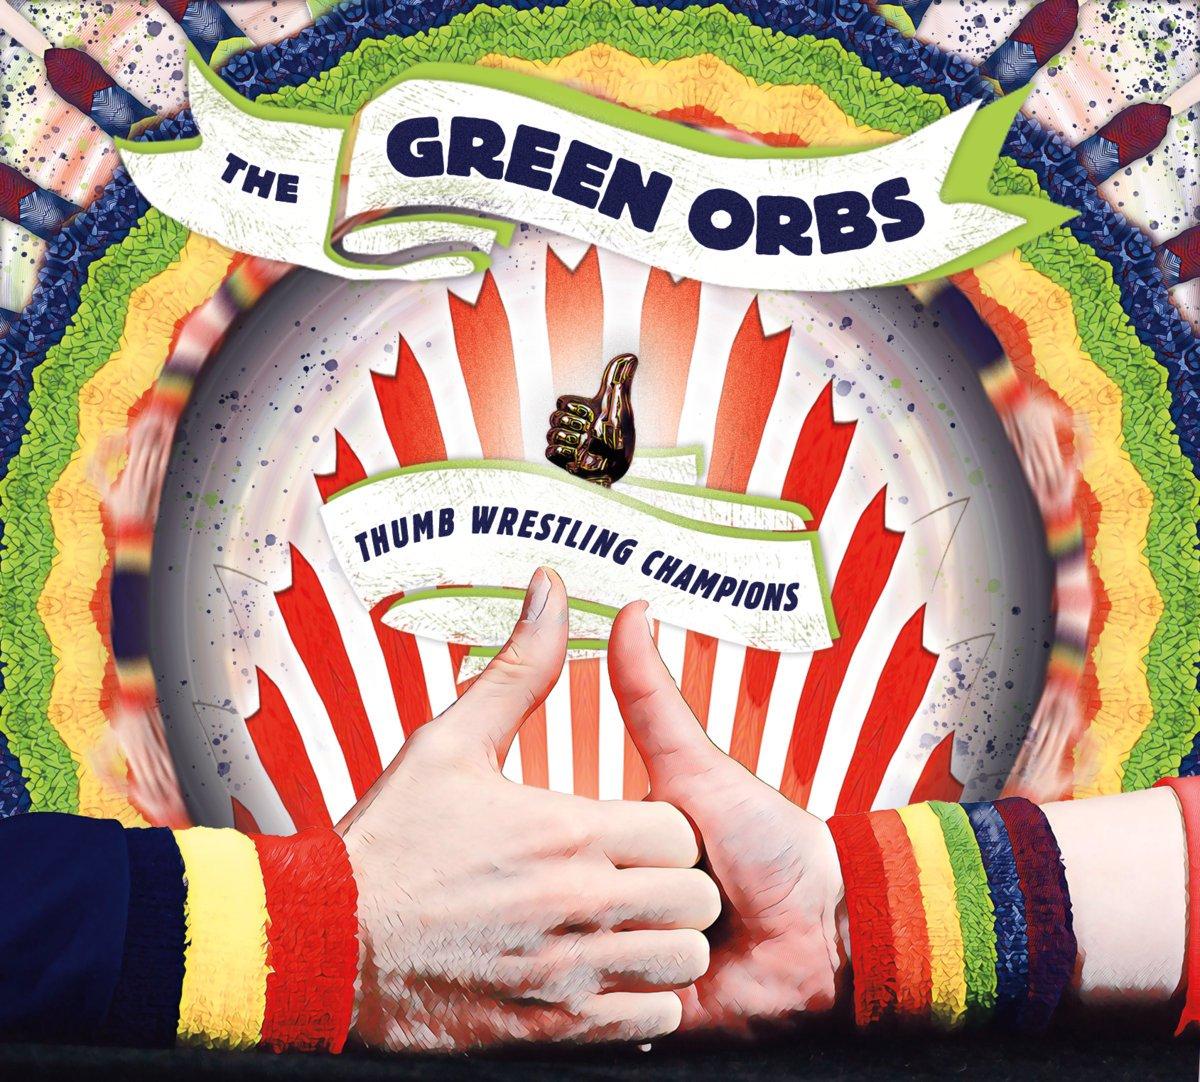 The Green Orbs